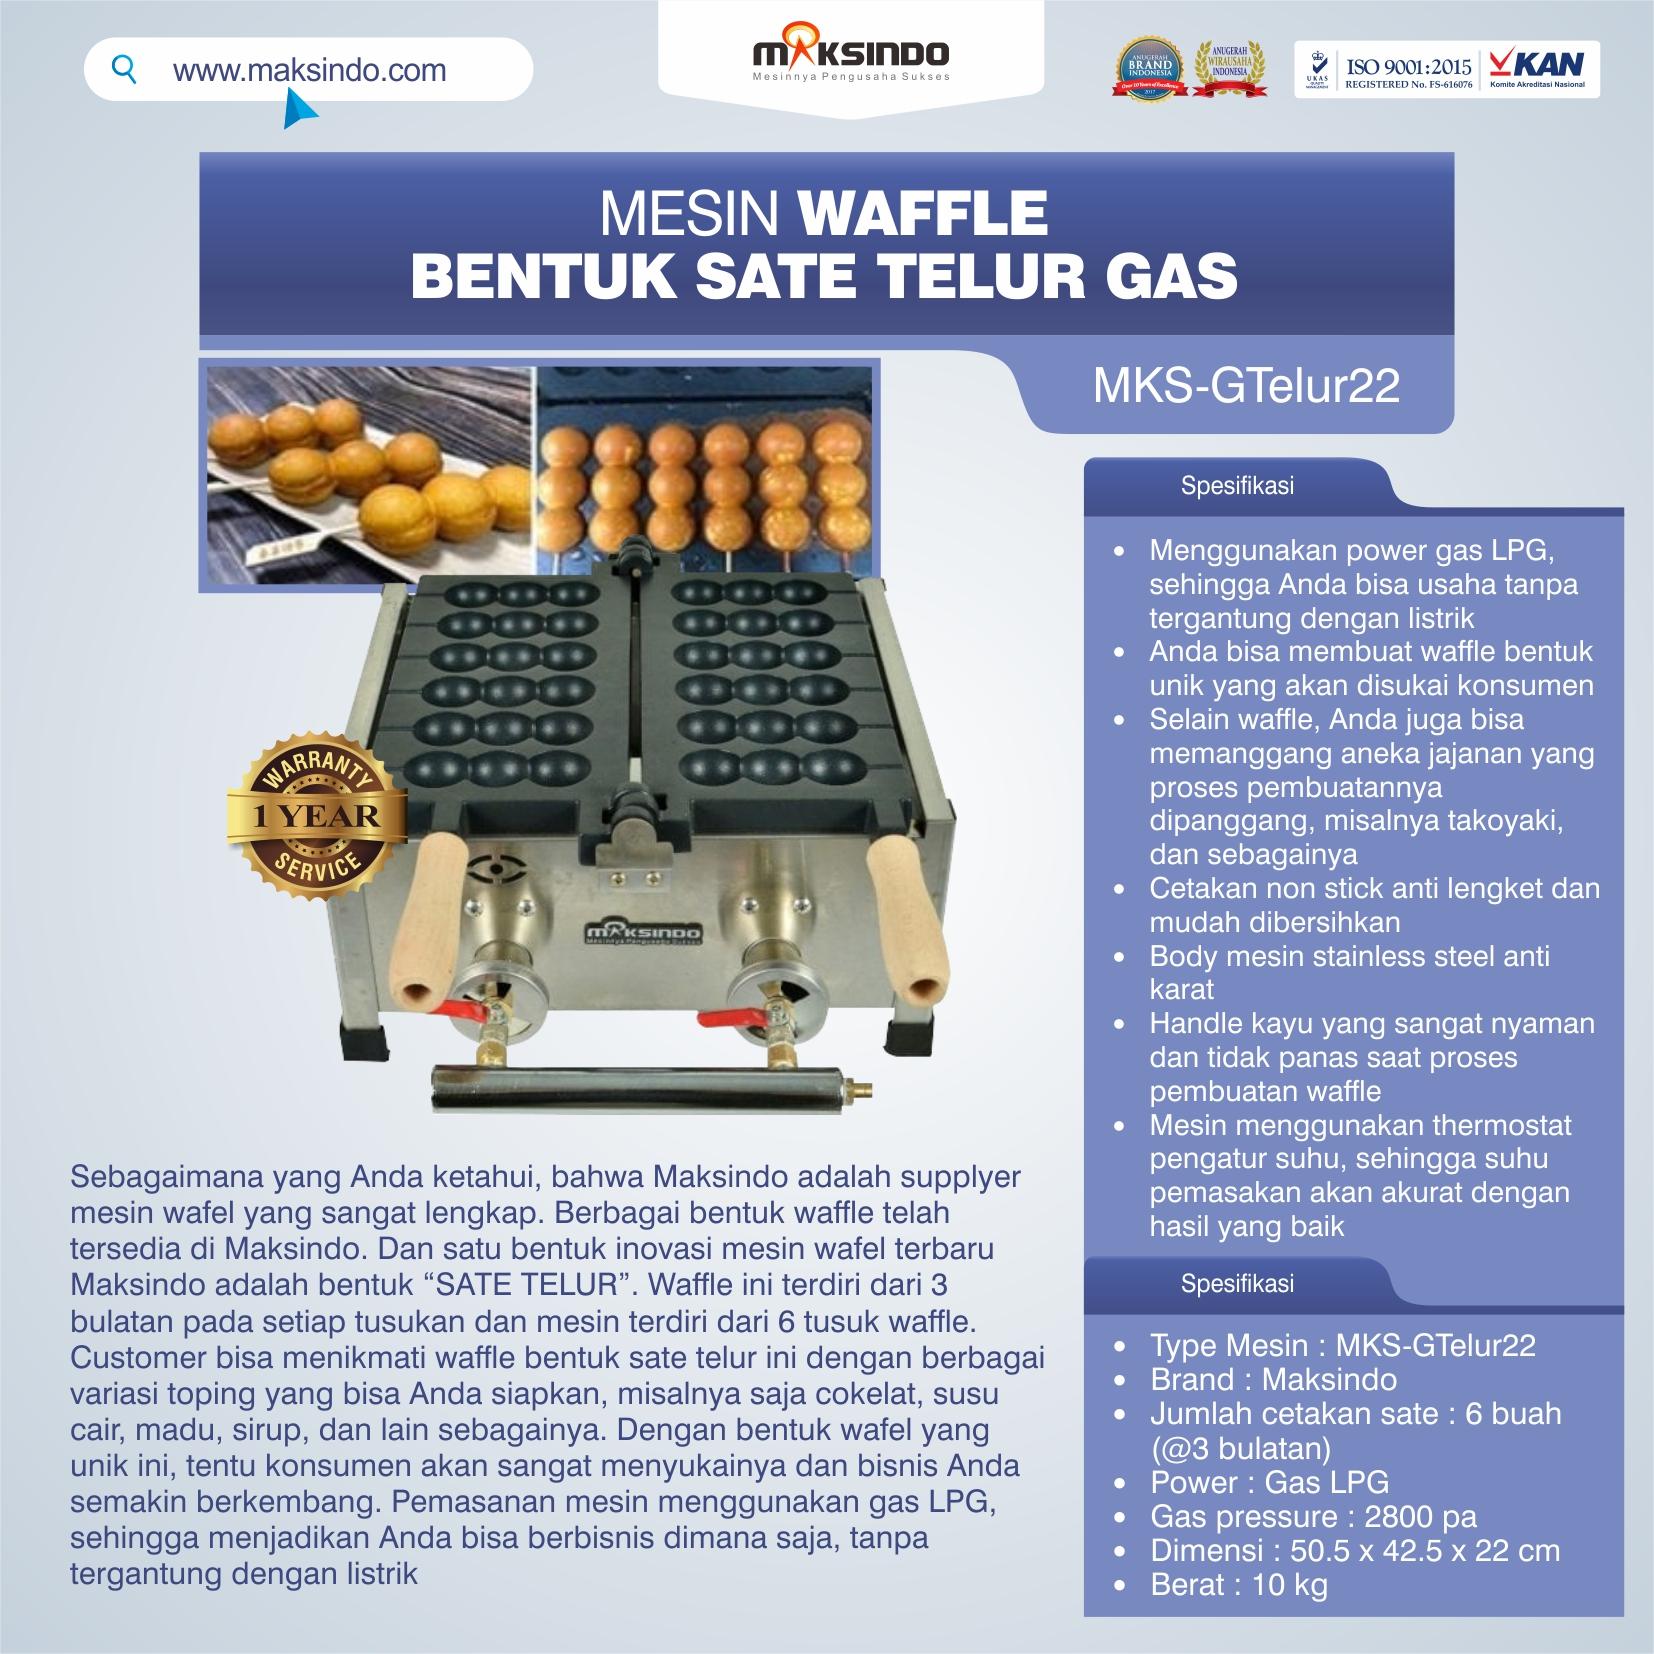 Jual Mesin Waffle Bentuk Sate Telur GAS – MKS-GTelur22 di Makassar